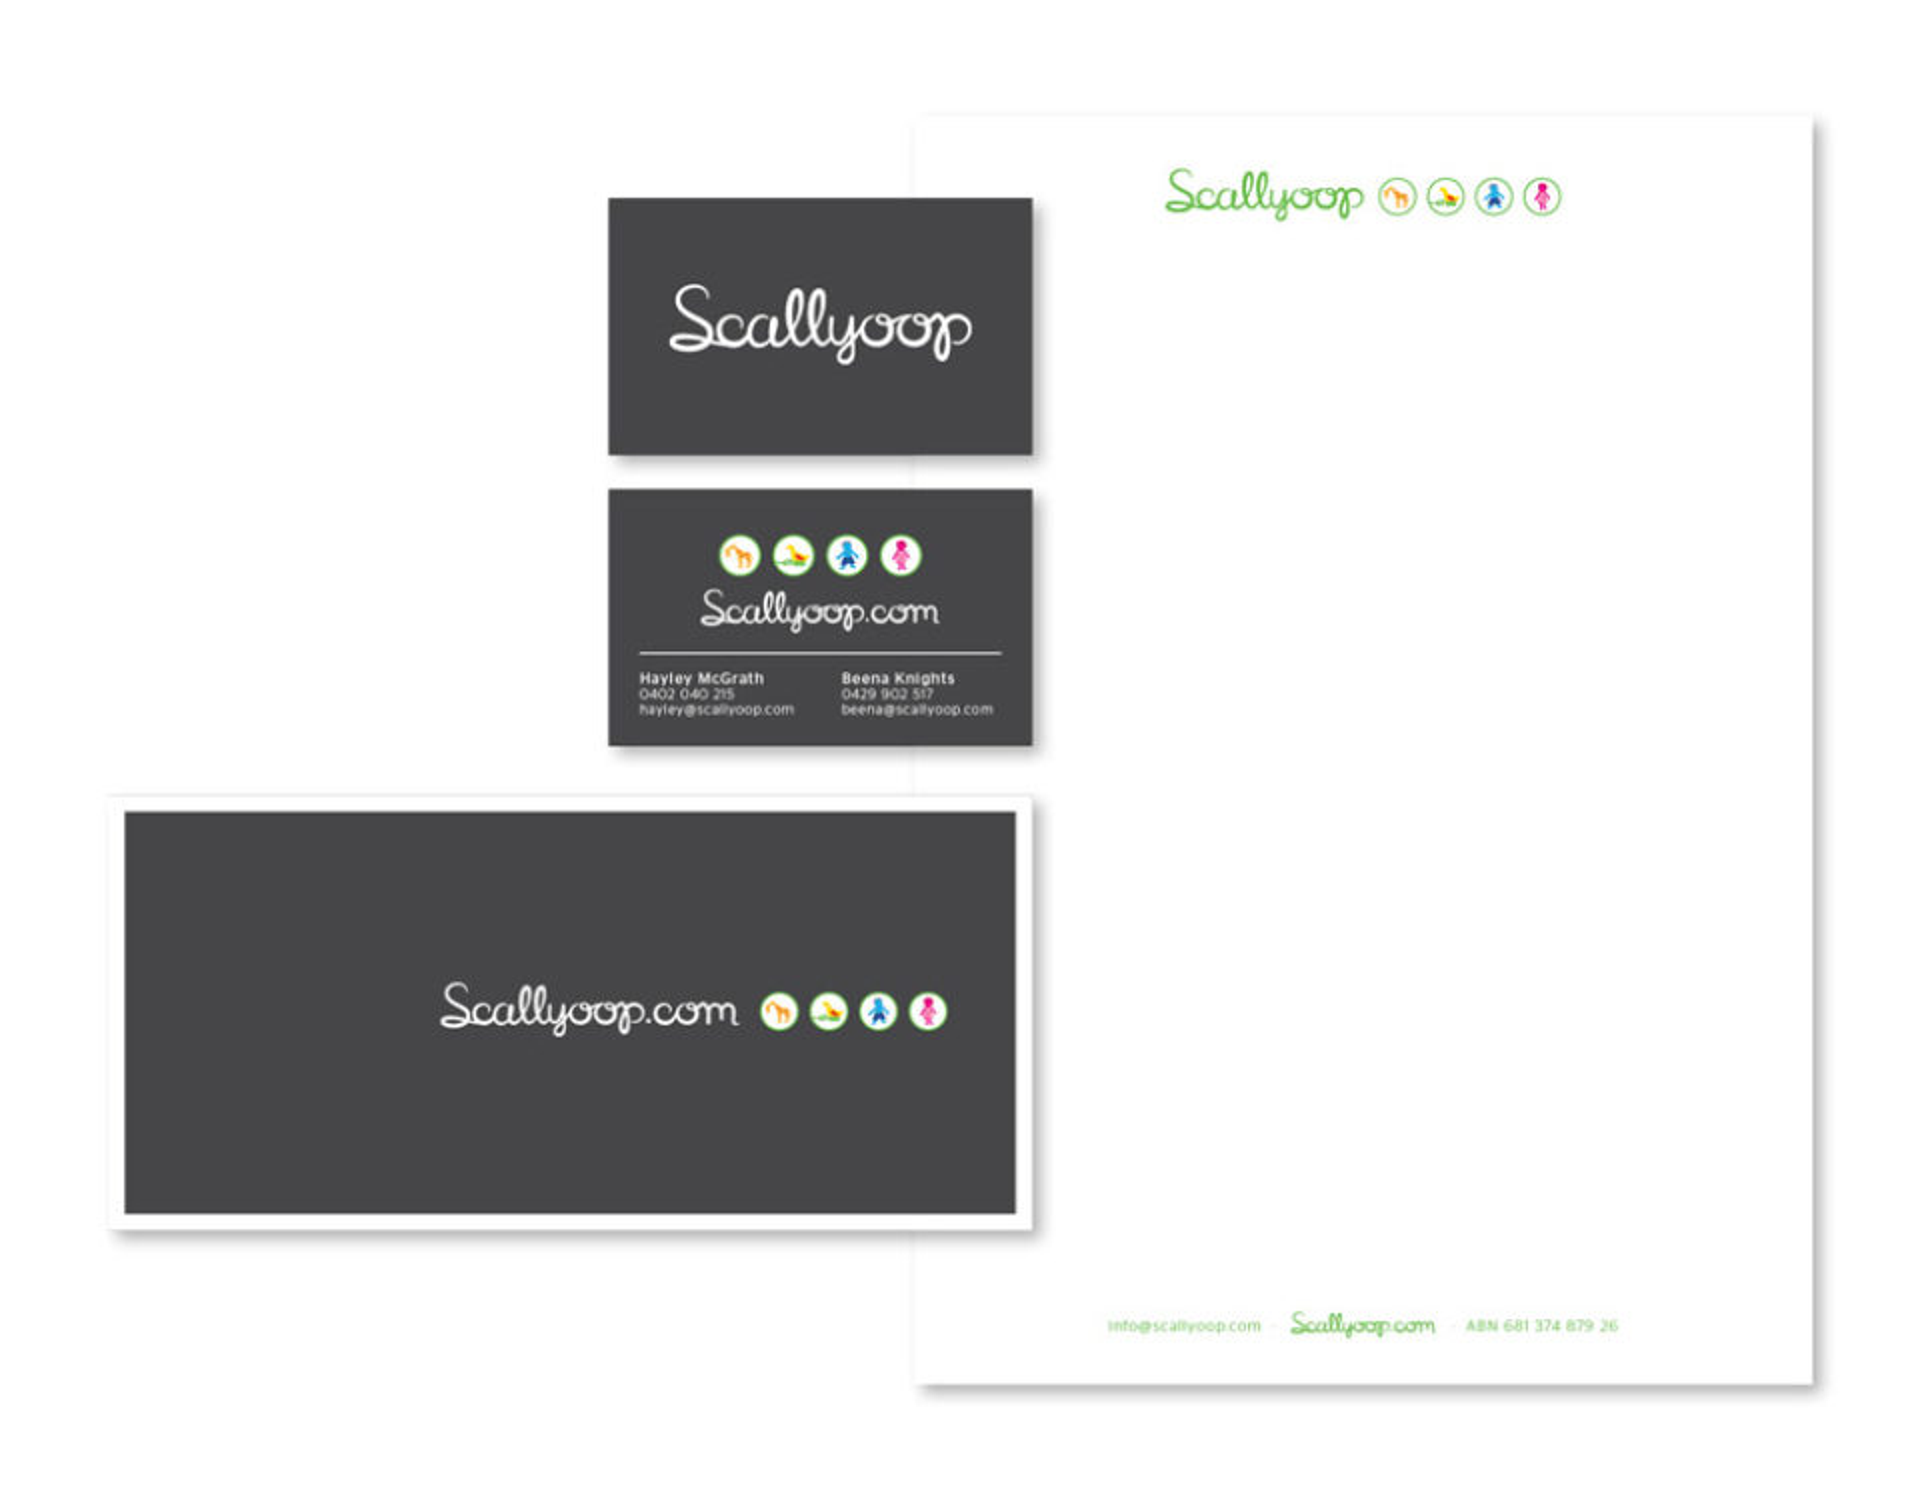 Scallyoop 05